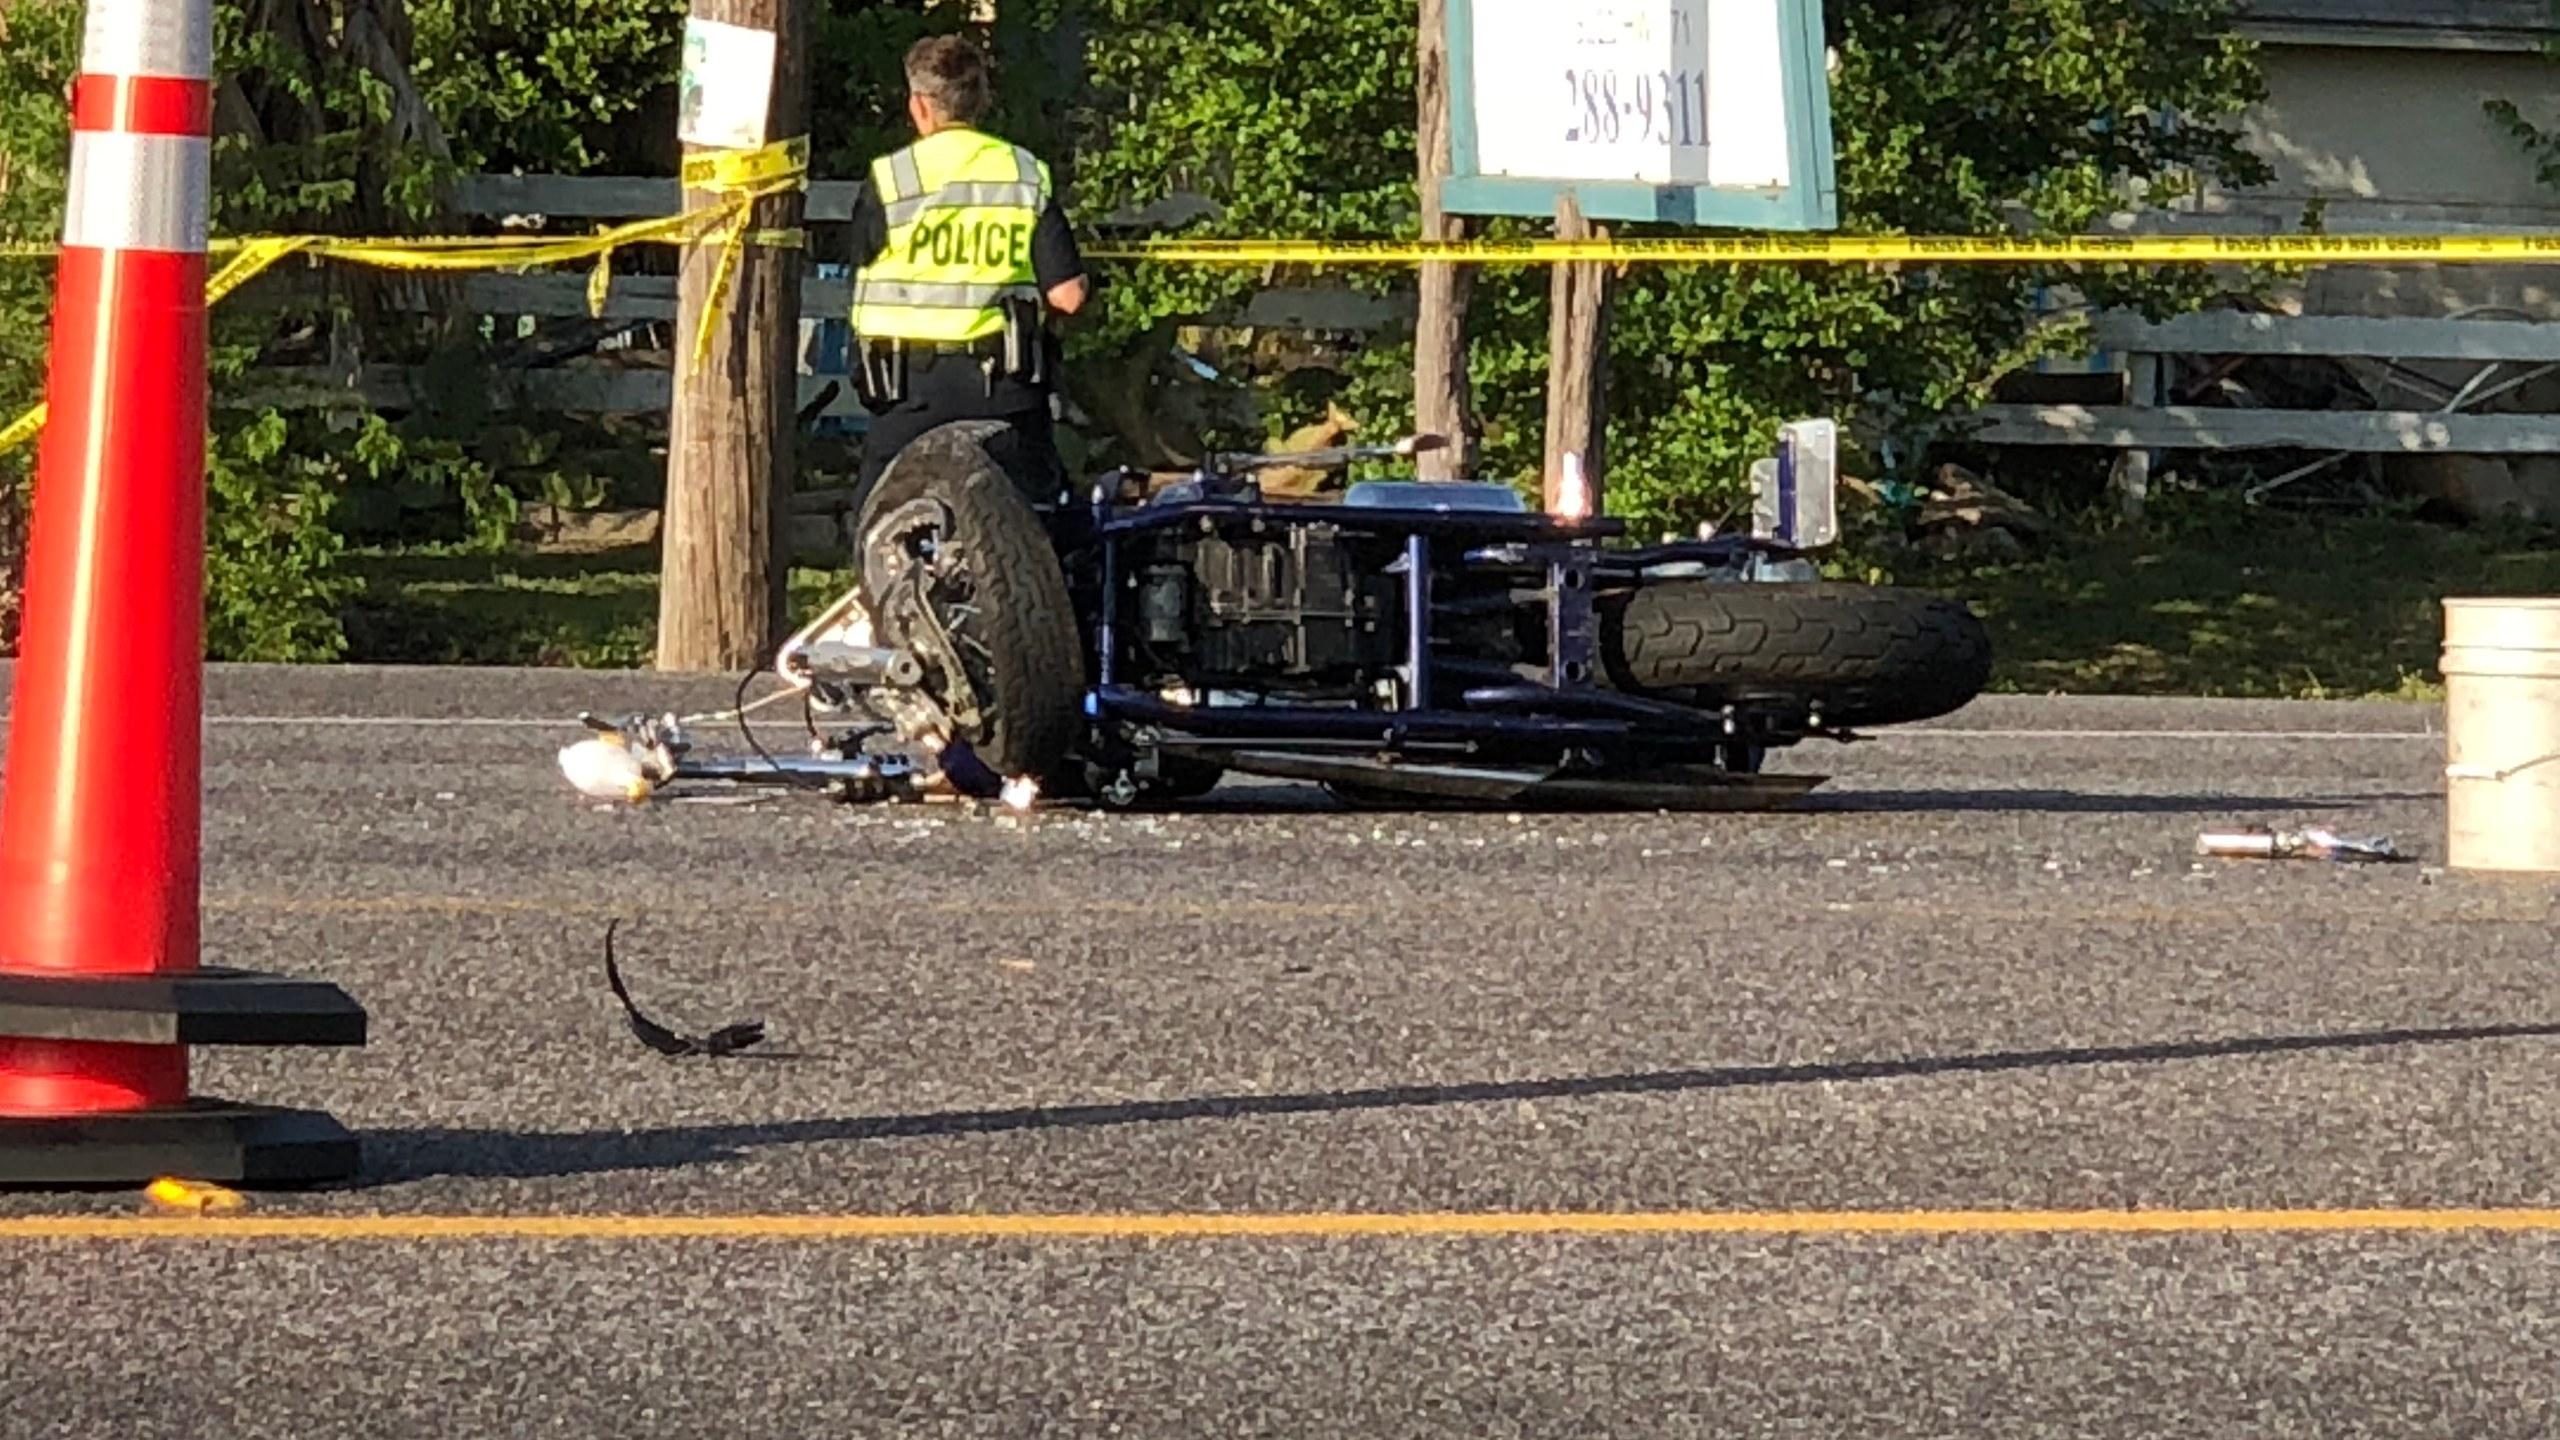 A motorcyclist was killed on SH 71 near Silvermine Drive in southwest Austin on April 12, 2018